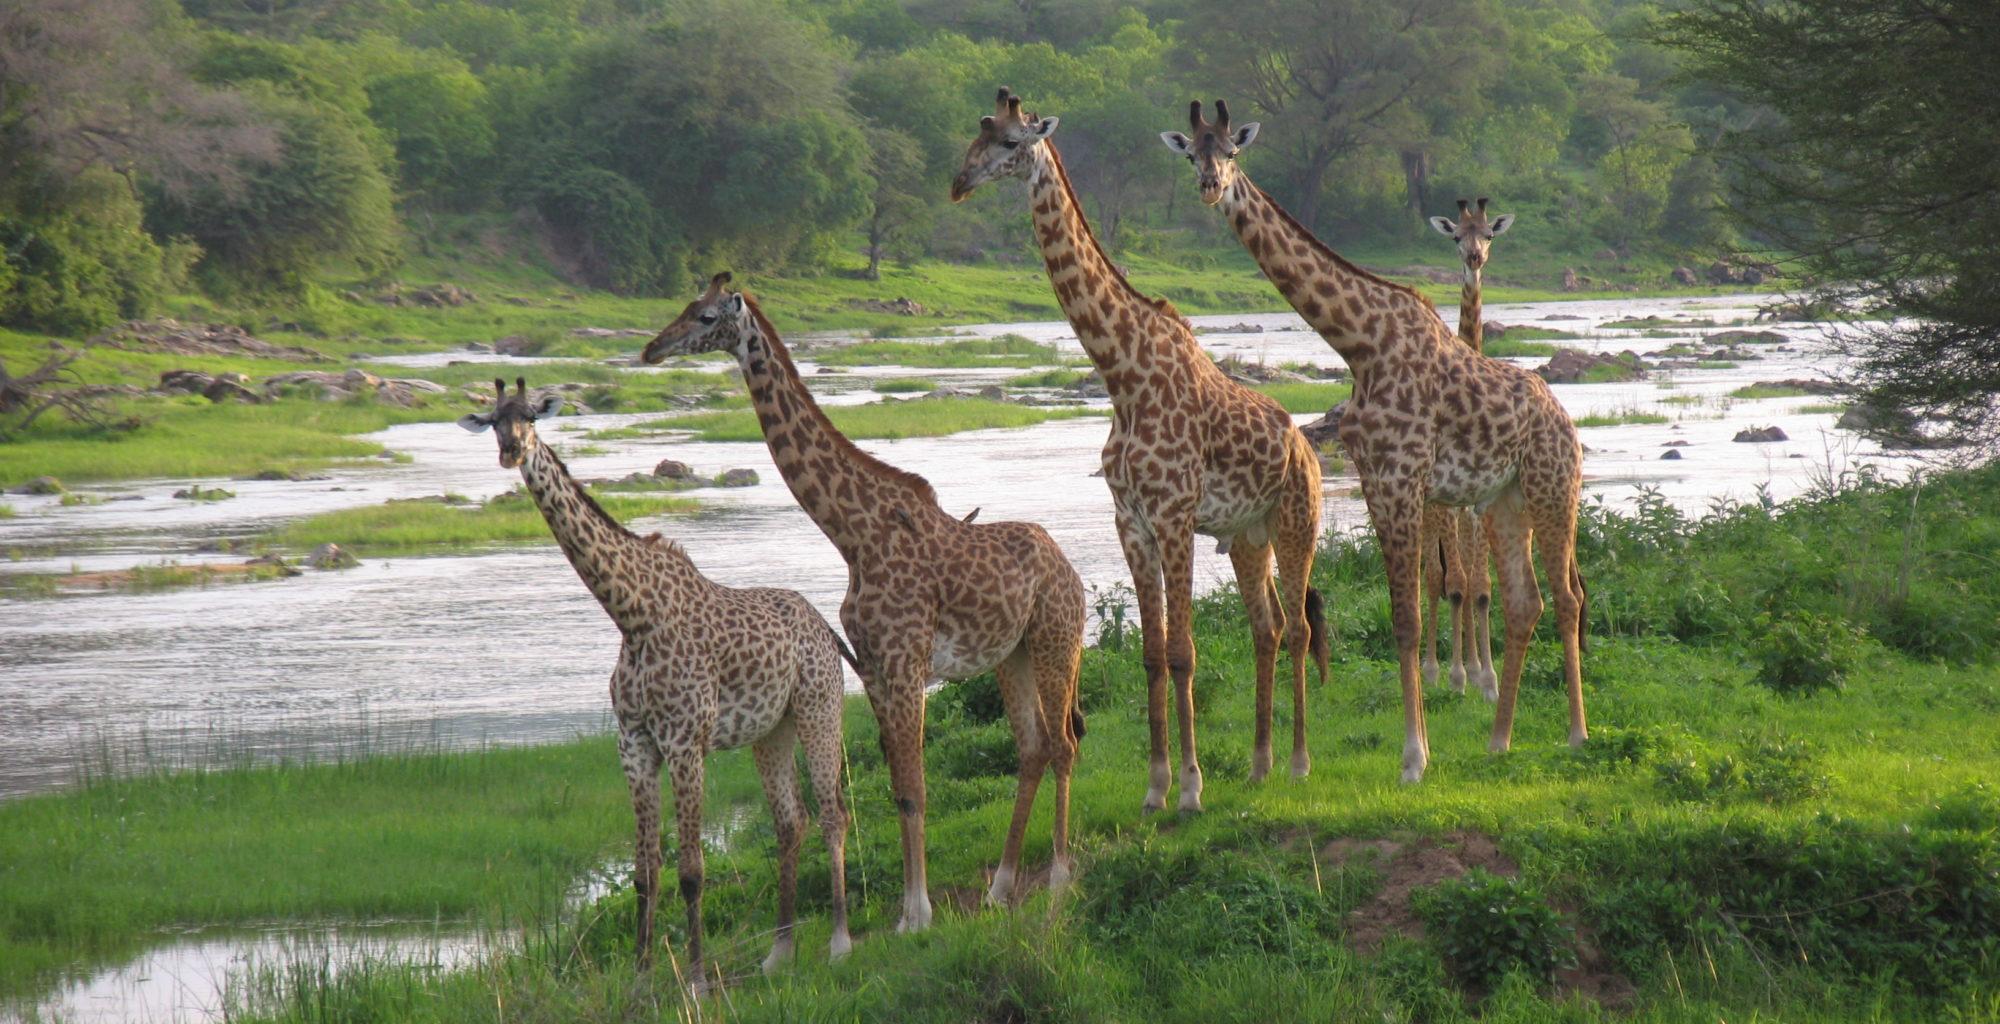 Tanzania-Ruaha-National-Park-Giraffes